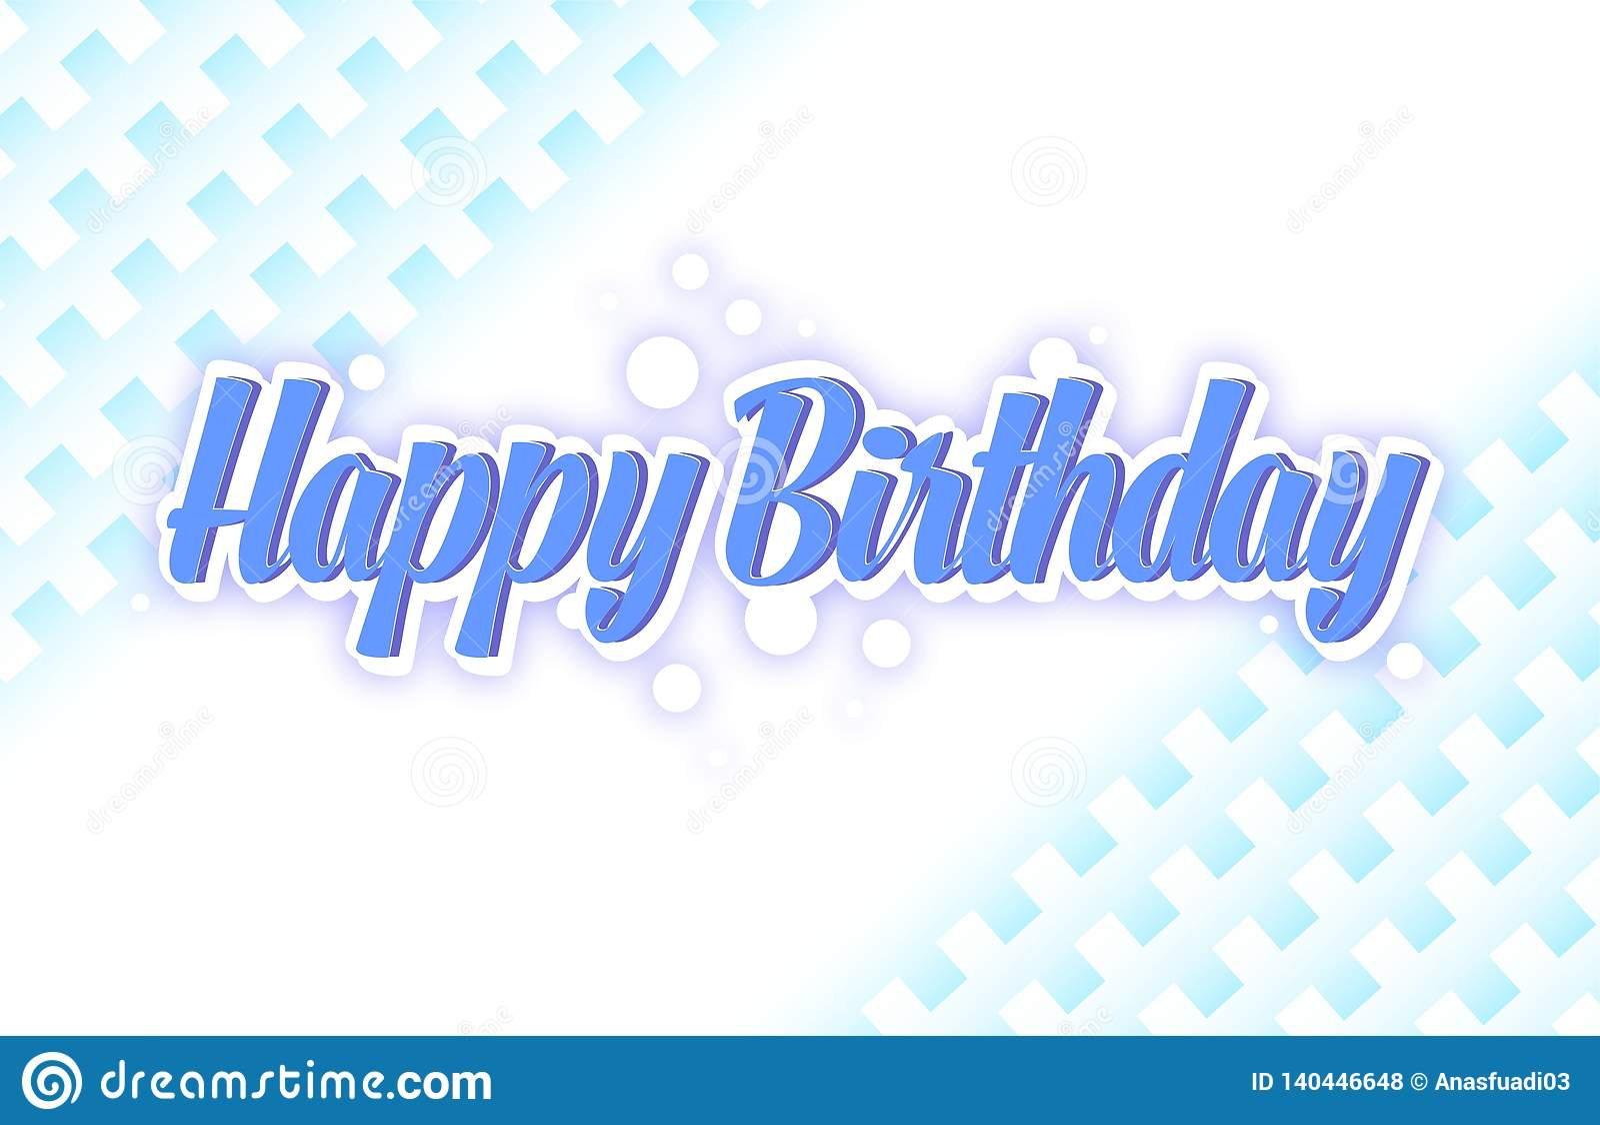 simple birthday greeting card